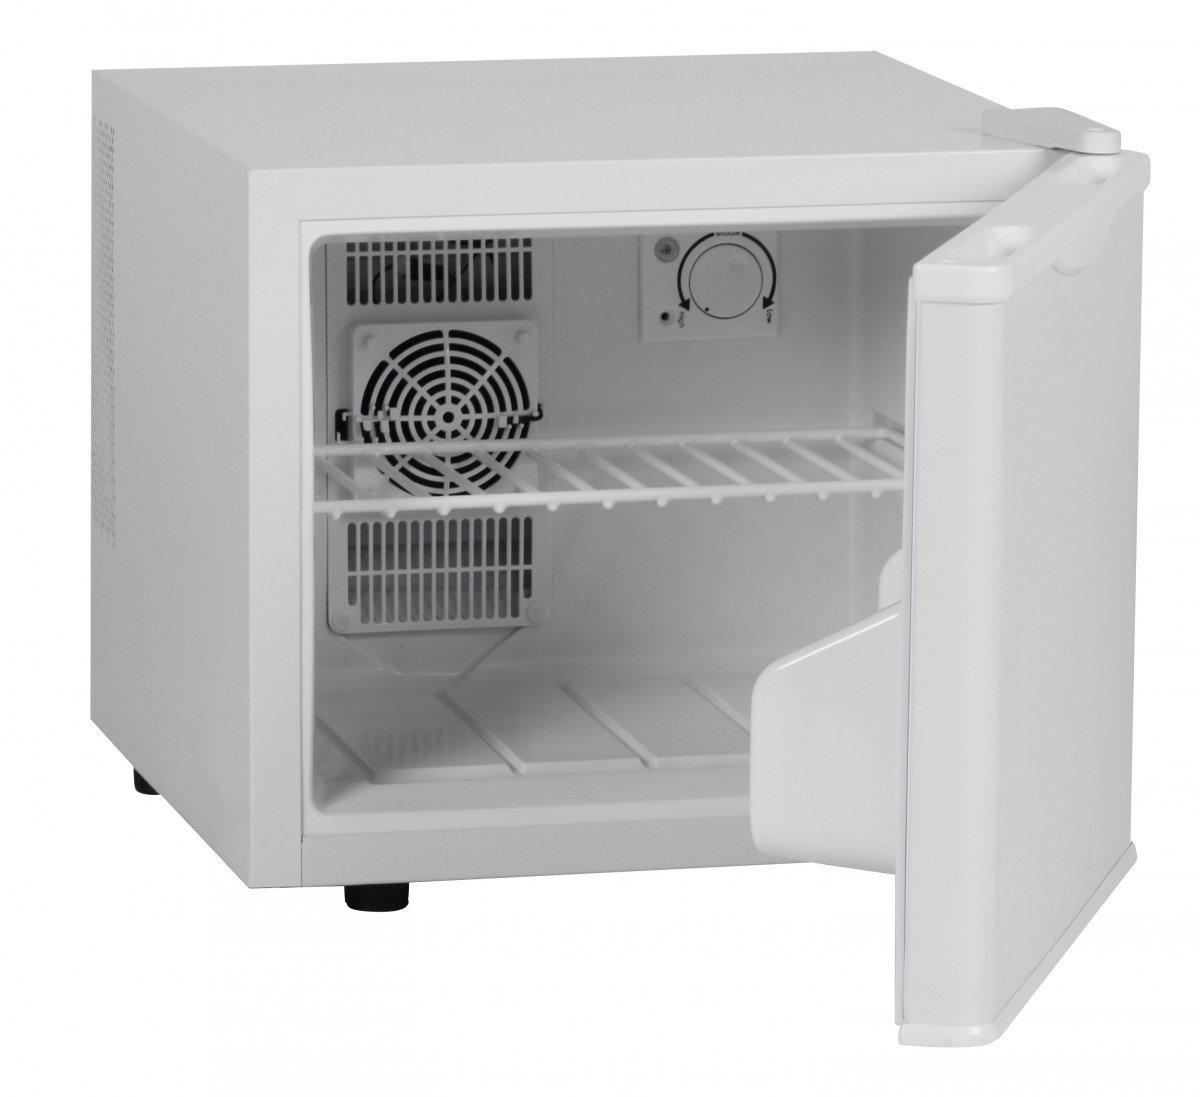 amstyle mini k hlschrank 17 liter minibar wei getr nkek hlschrank 5 bis 15 c eek a. Black Bedroom Furniture Sets. Home Design Ideas